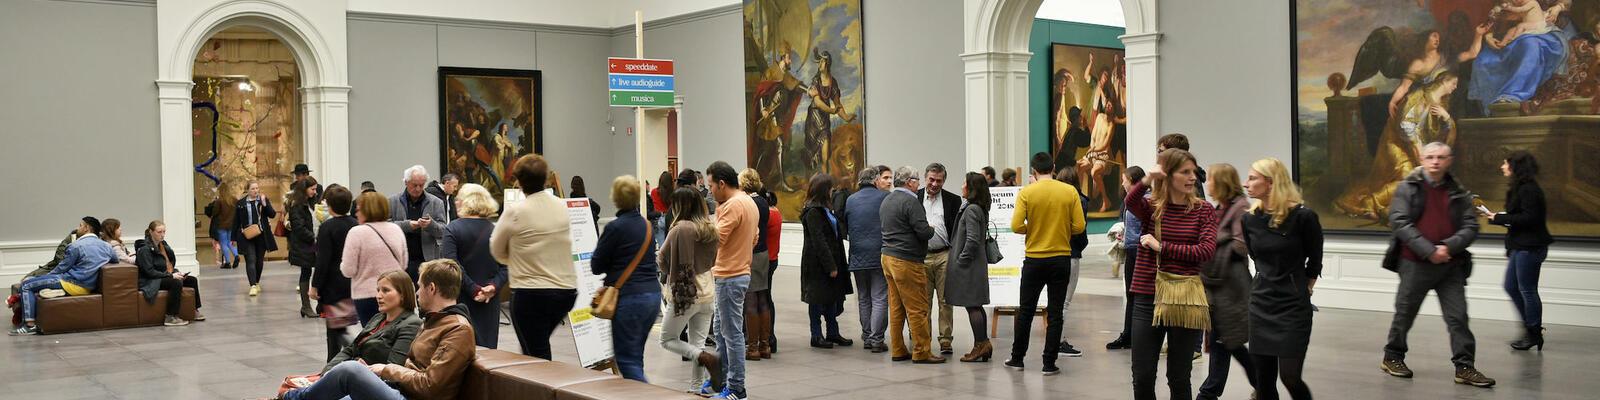 Museumbezoek